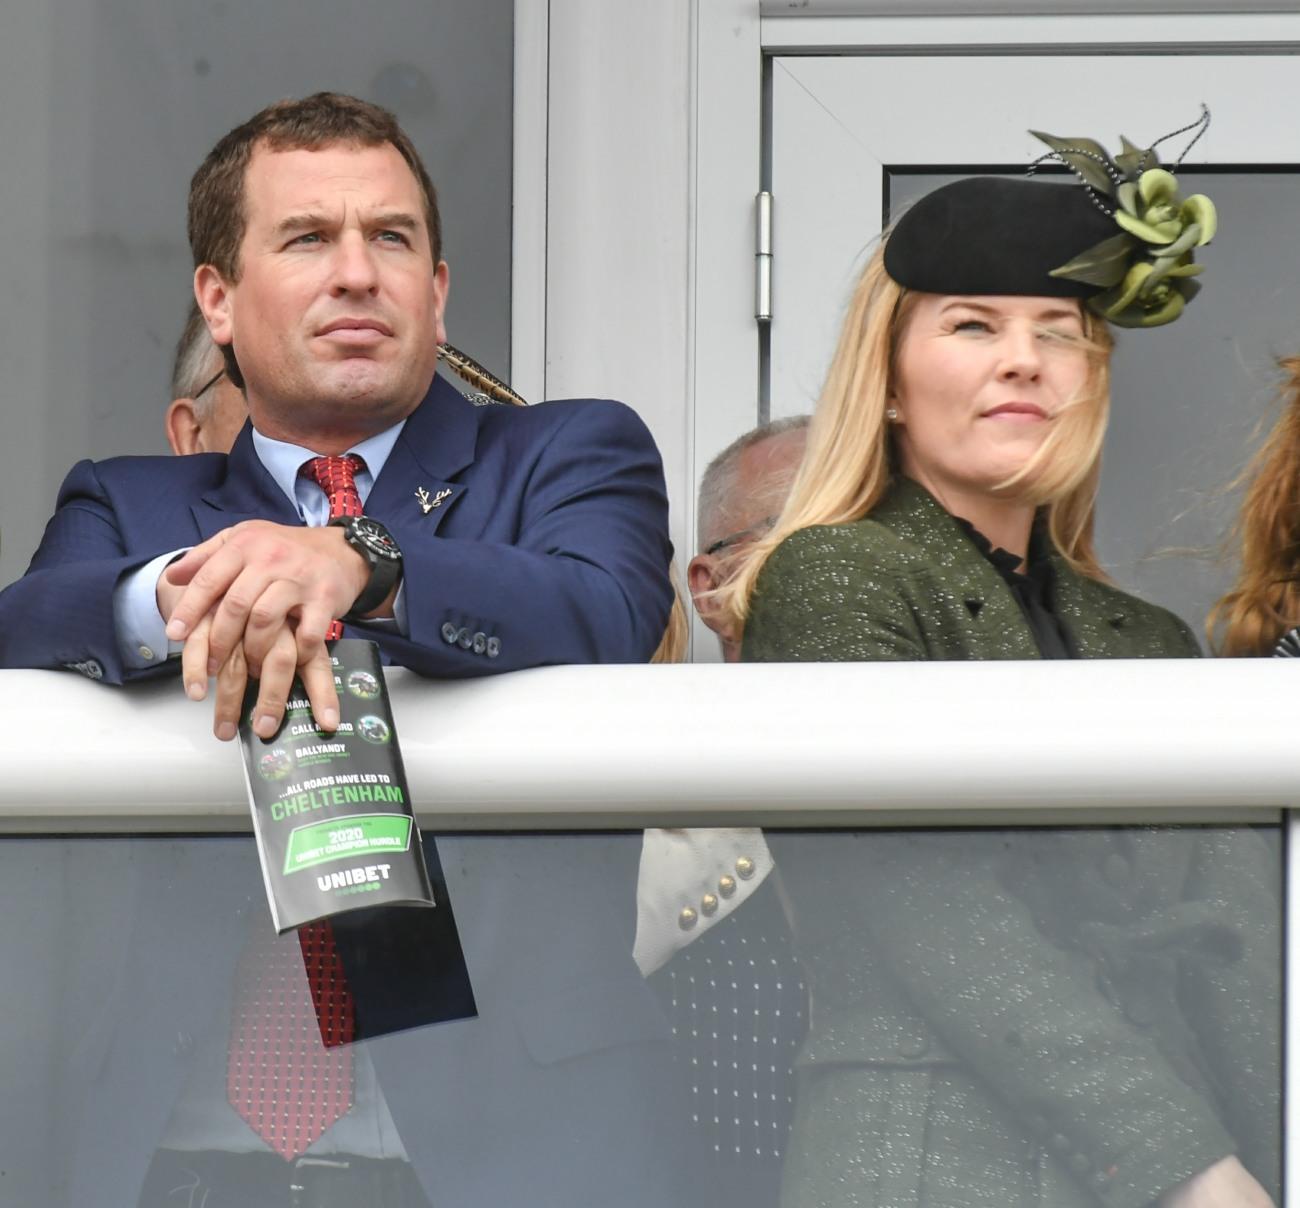 Peter and Autumn Phillips seen enjoying the racing at day one of The Festival, Cheltenham Racecourse, Prestbury, Cheltenham, Glos